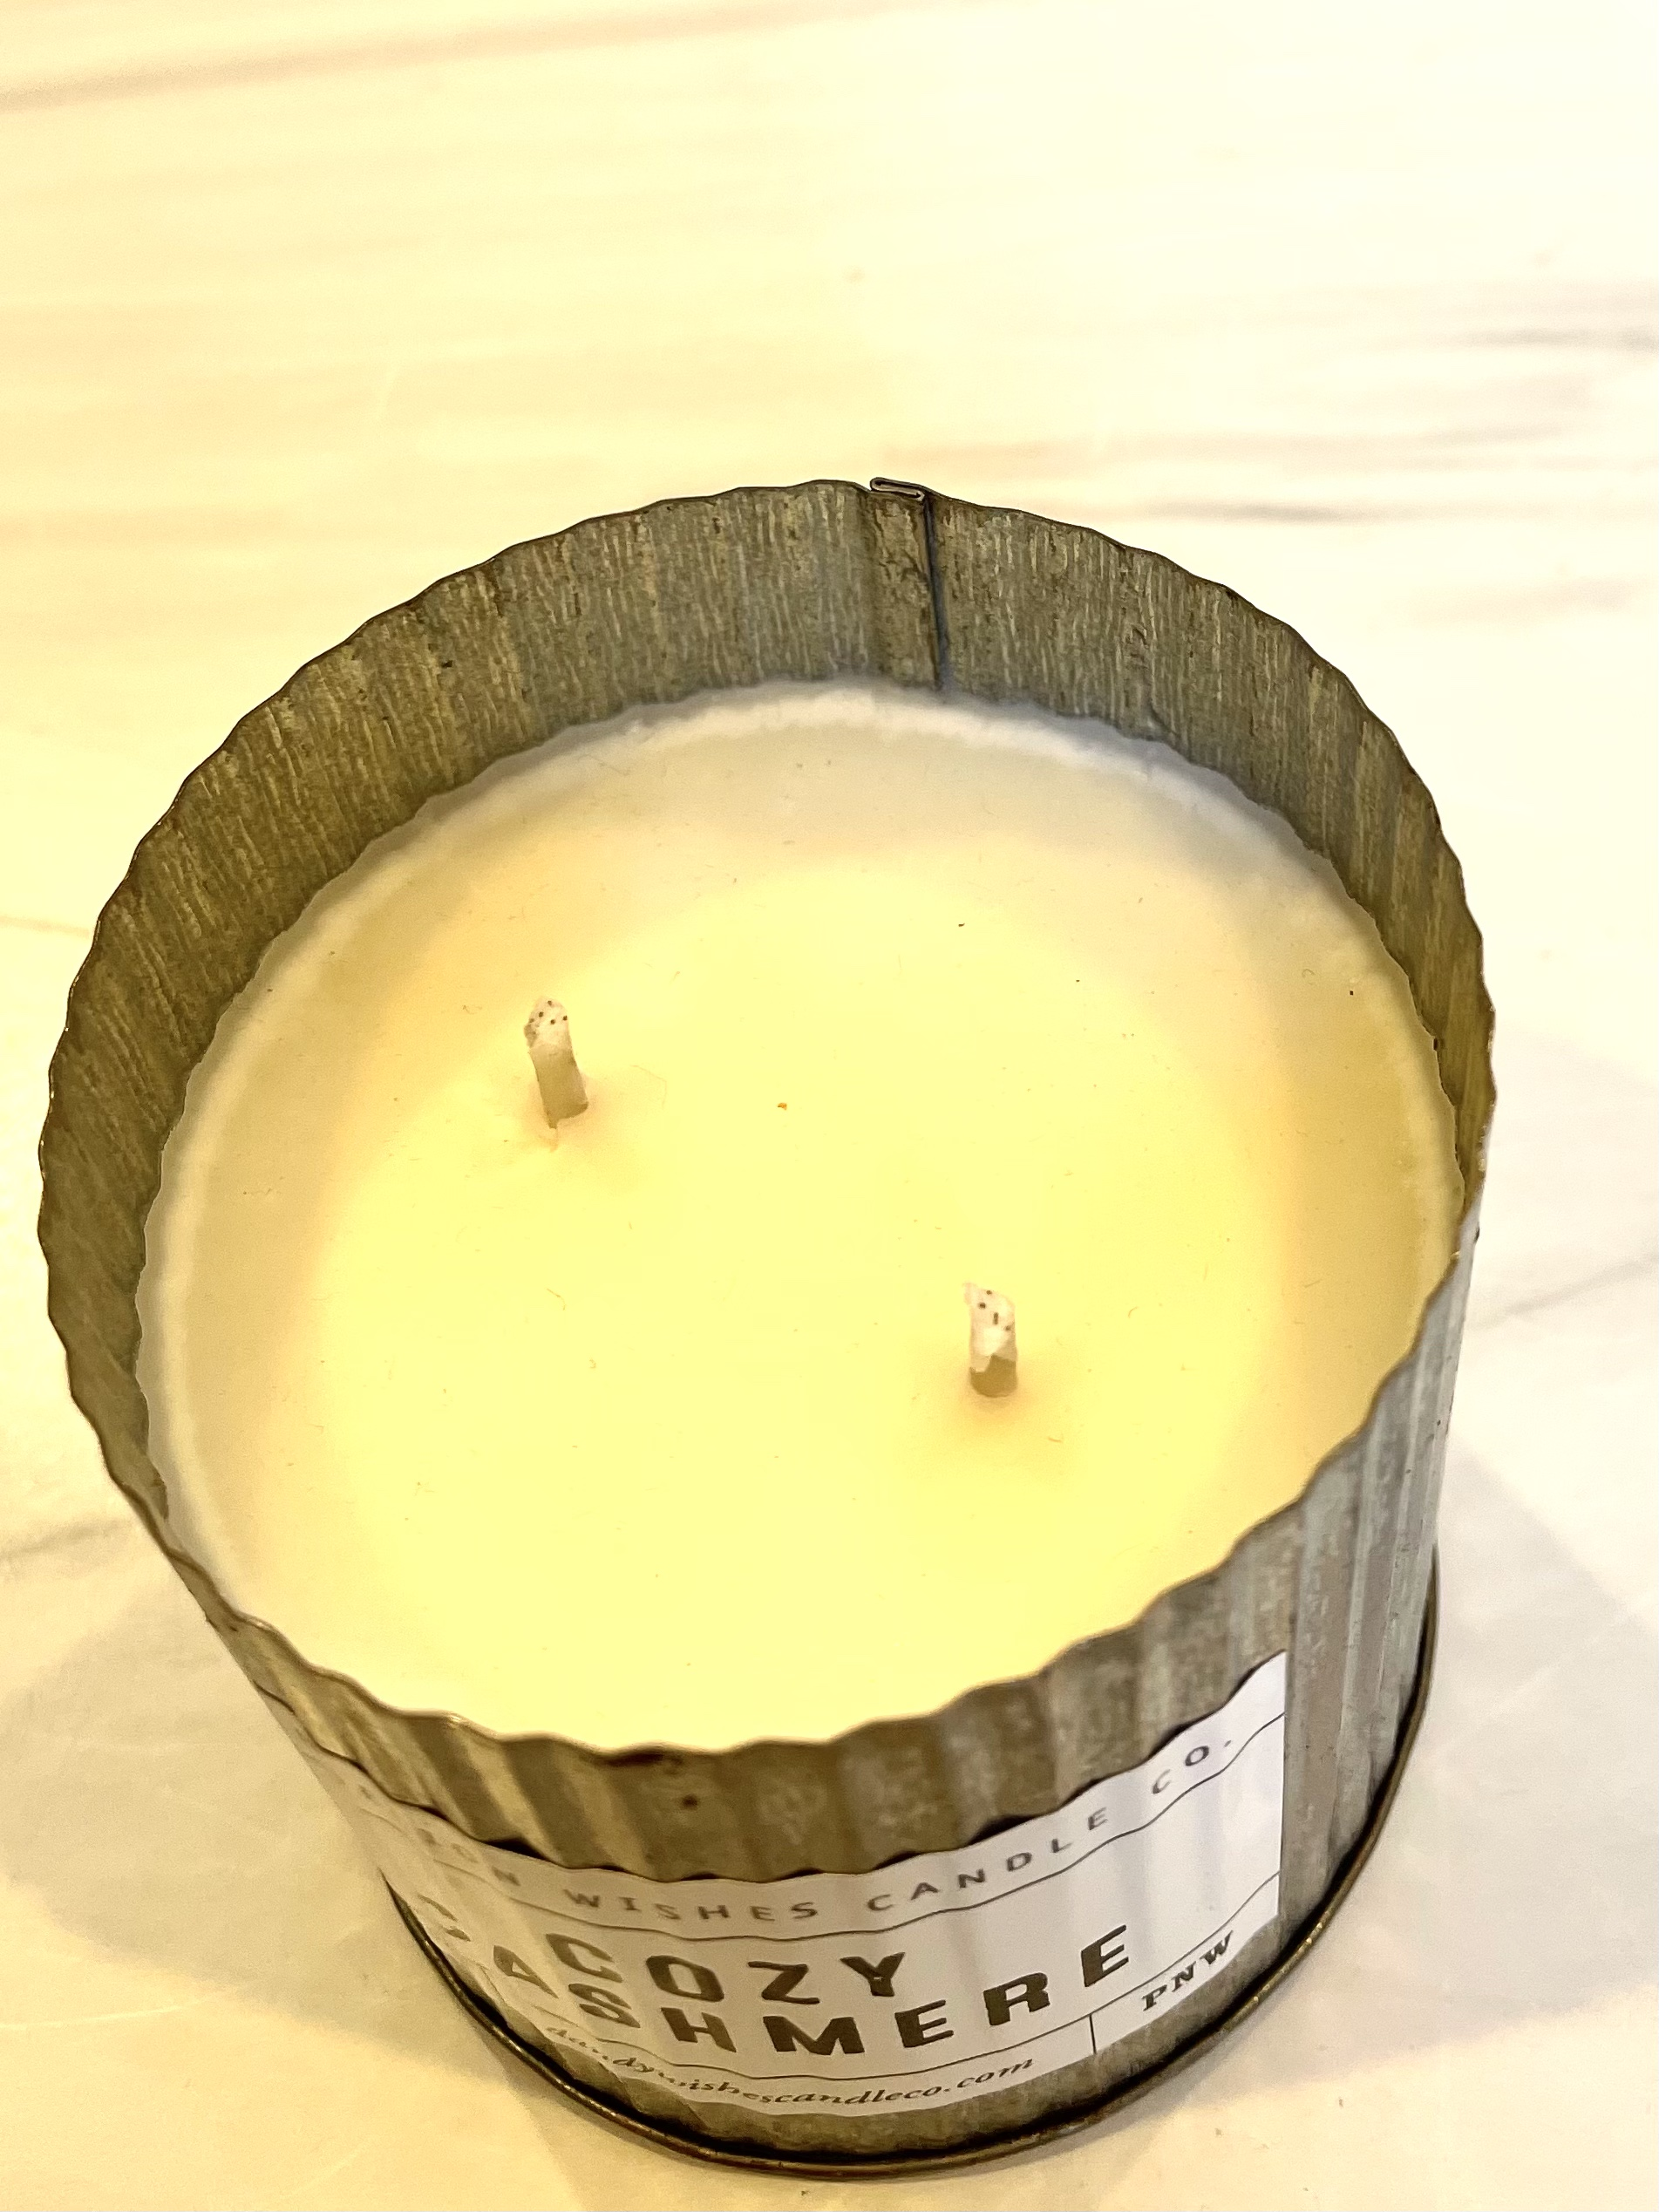 Cozy Cashmere, Rustic Galvanized Tin Candle, 12oz